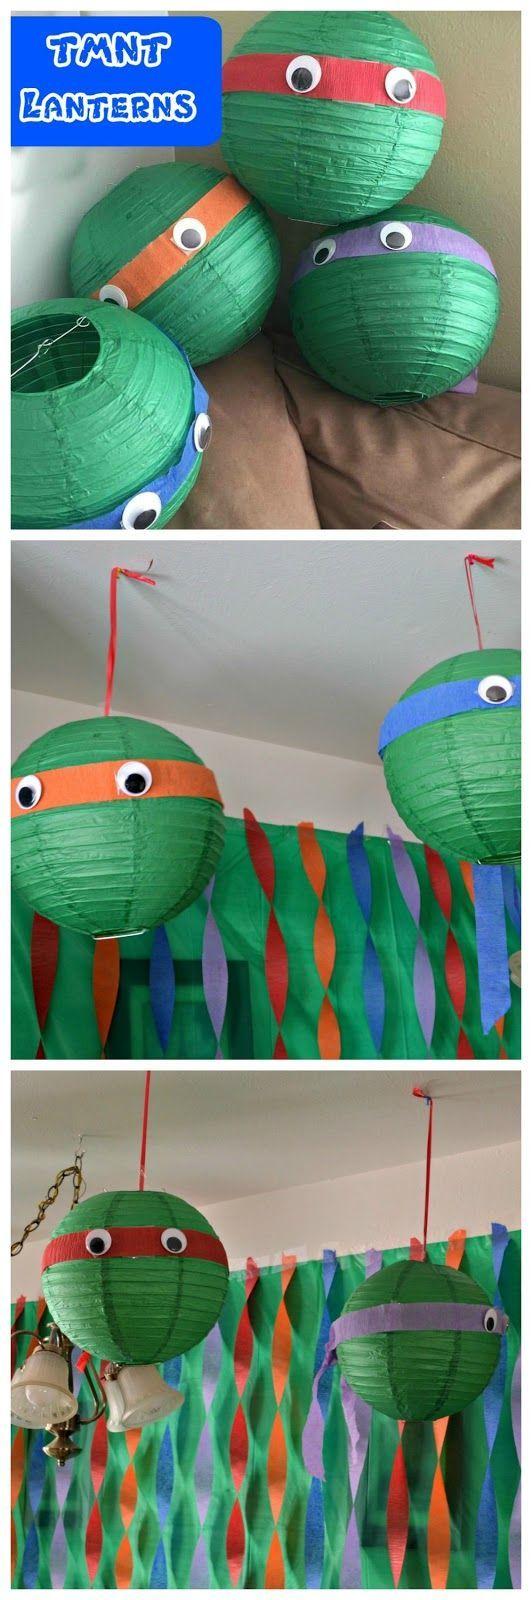 TMNT Lanterns